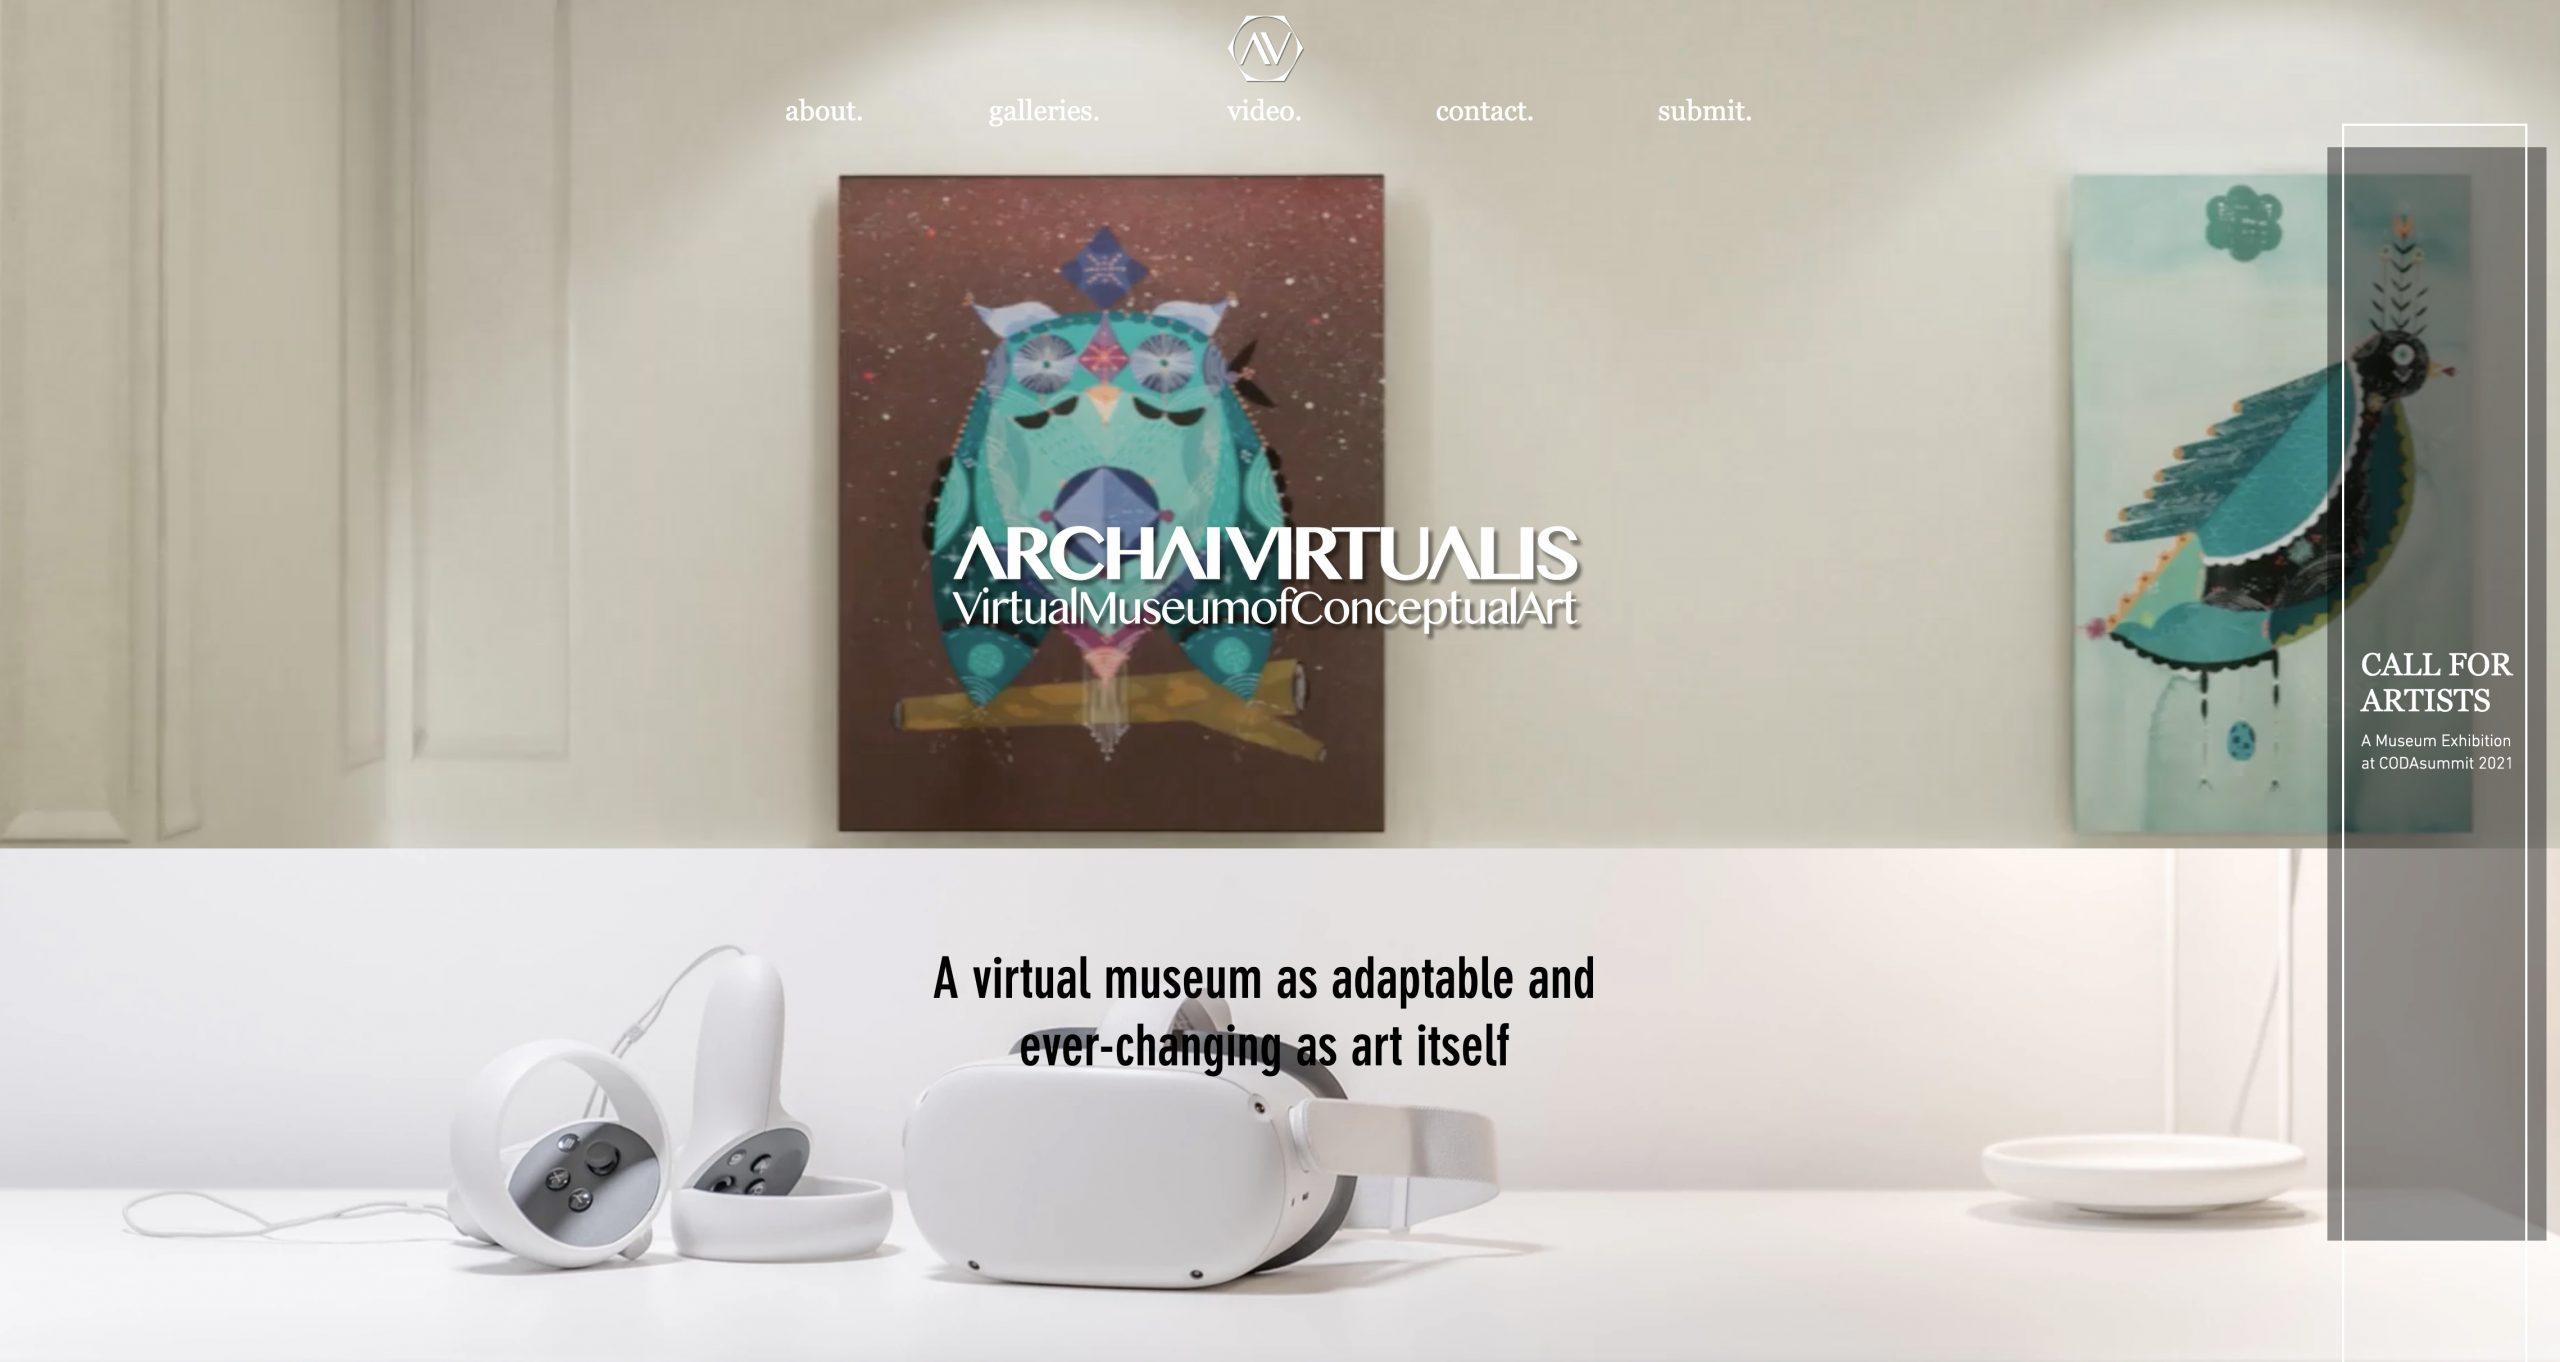 Archai Virtualis Virtual Museum of Conceptual Art